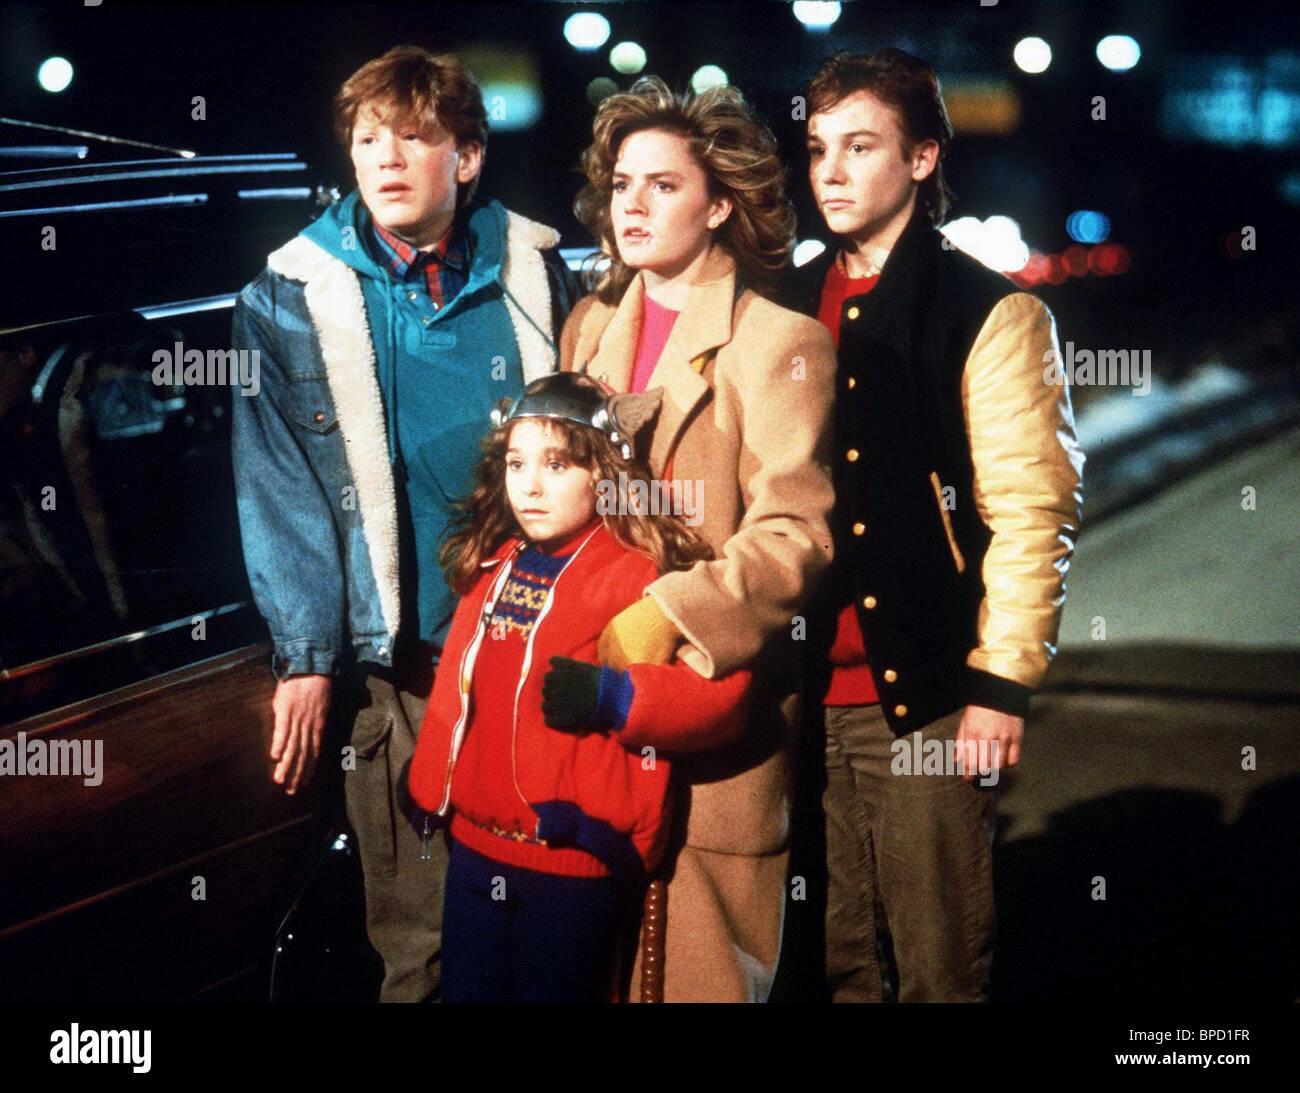 Jane Seymour (actress),Misty Dawn Adult pics & movies Eugenia Clinchard,Gladys Guevarra (b. 1977)